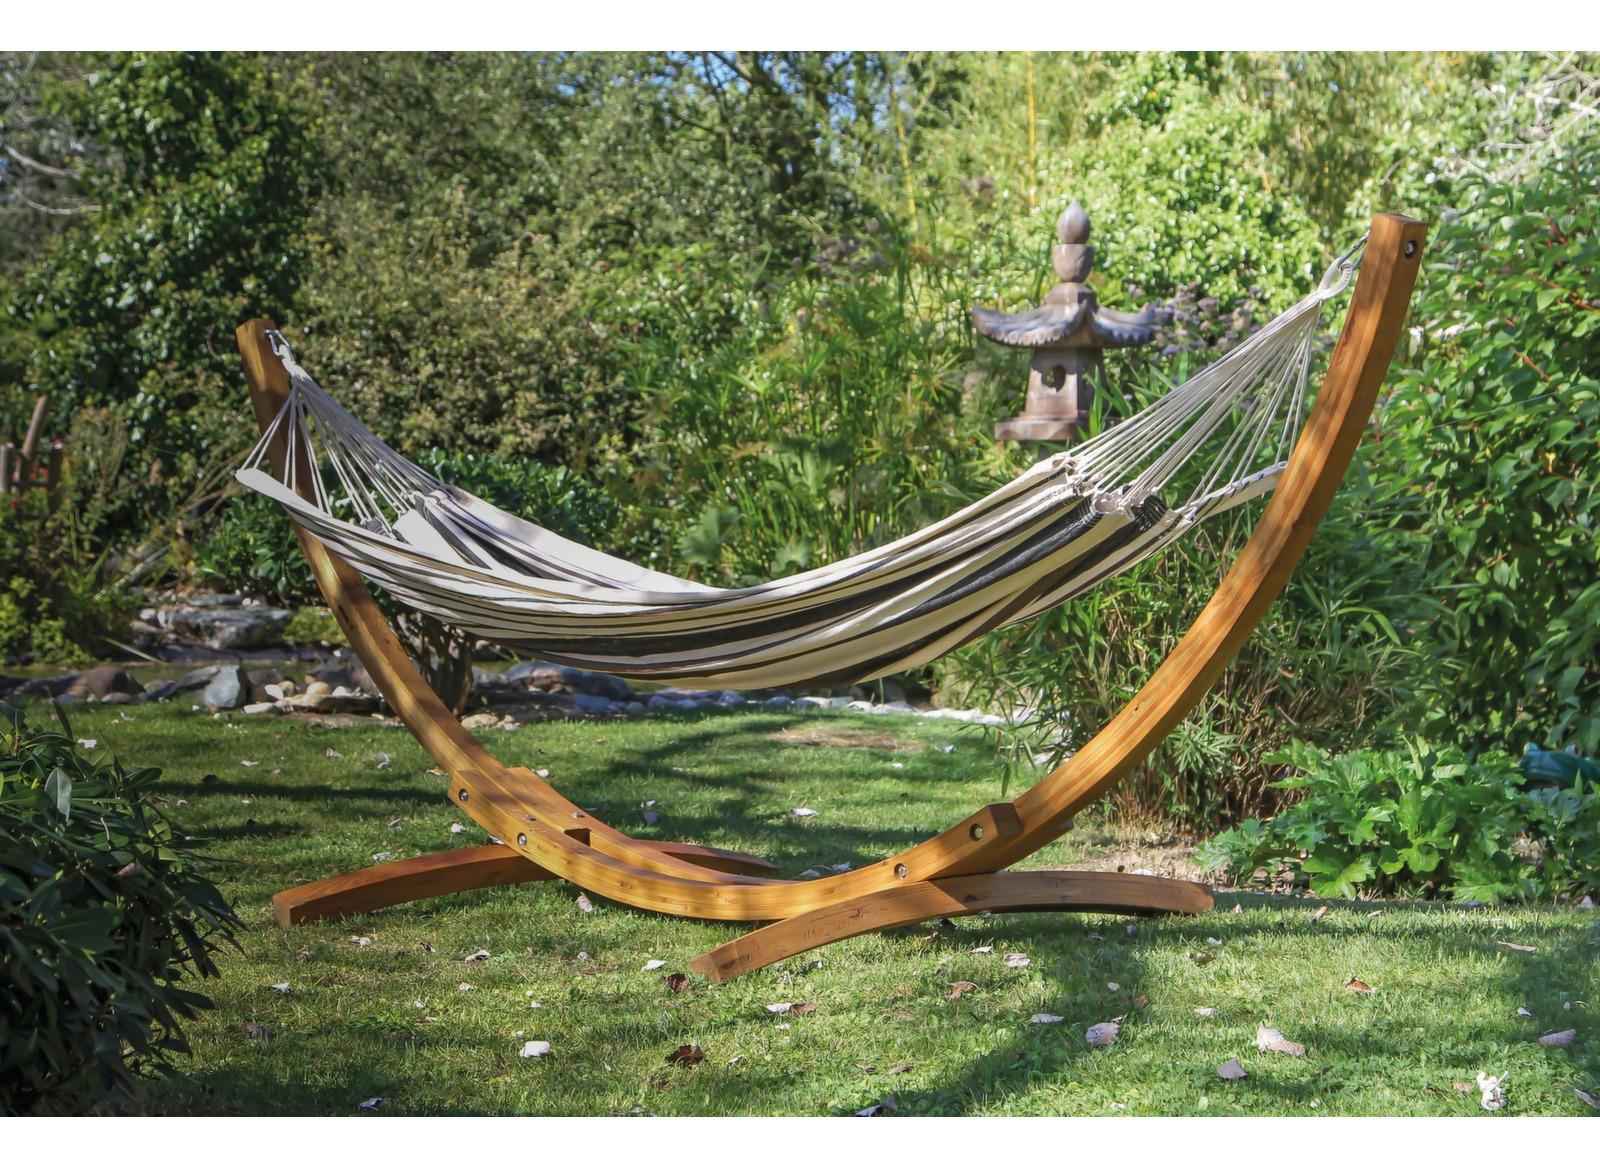 toile hamac hortensia hamac mobilier de jardin en ligne meubles de jardin design proloisirs. Black Bedroom Furniture Sets. Home Design Ideas